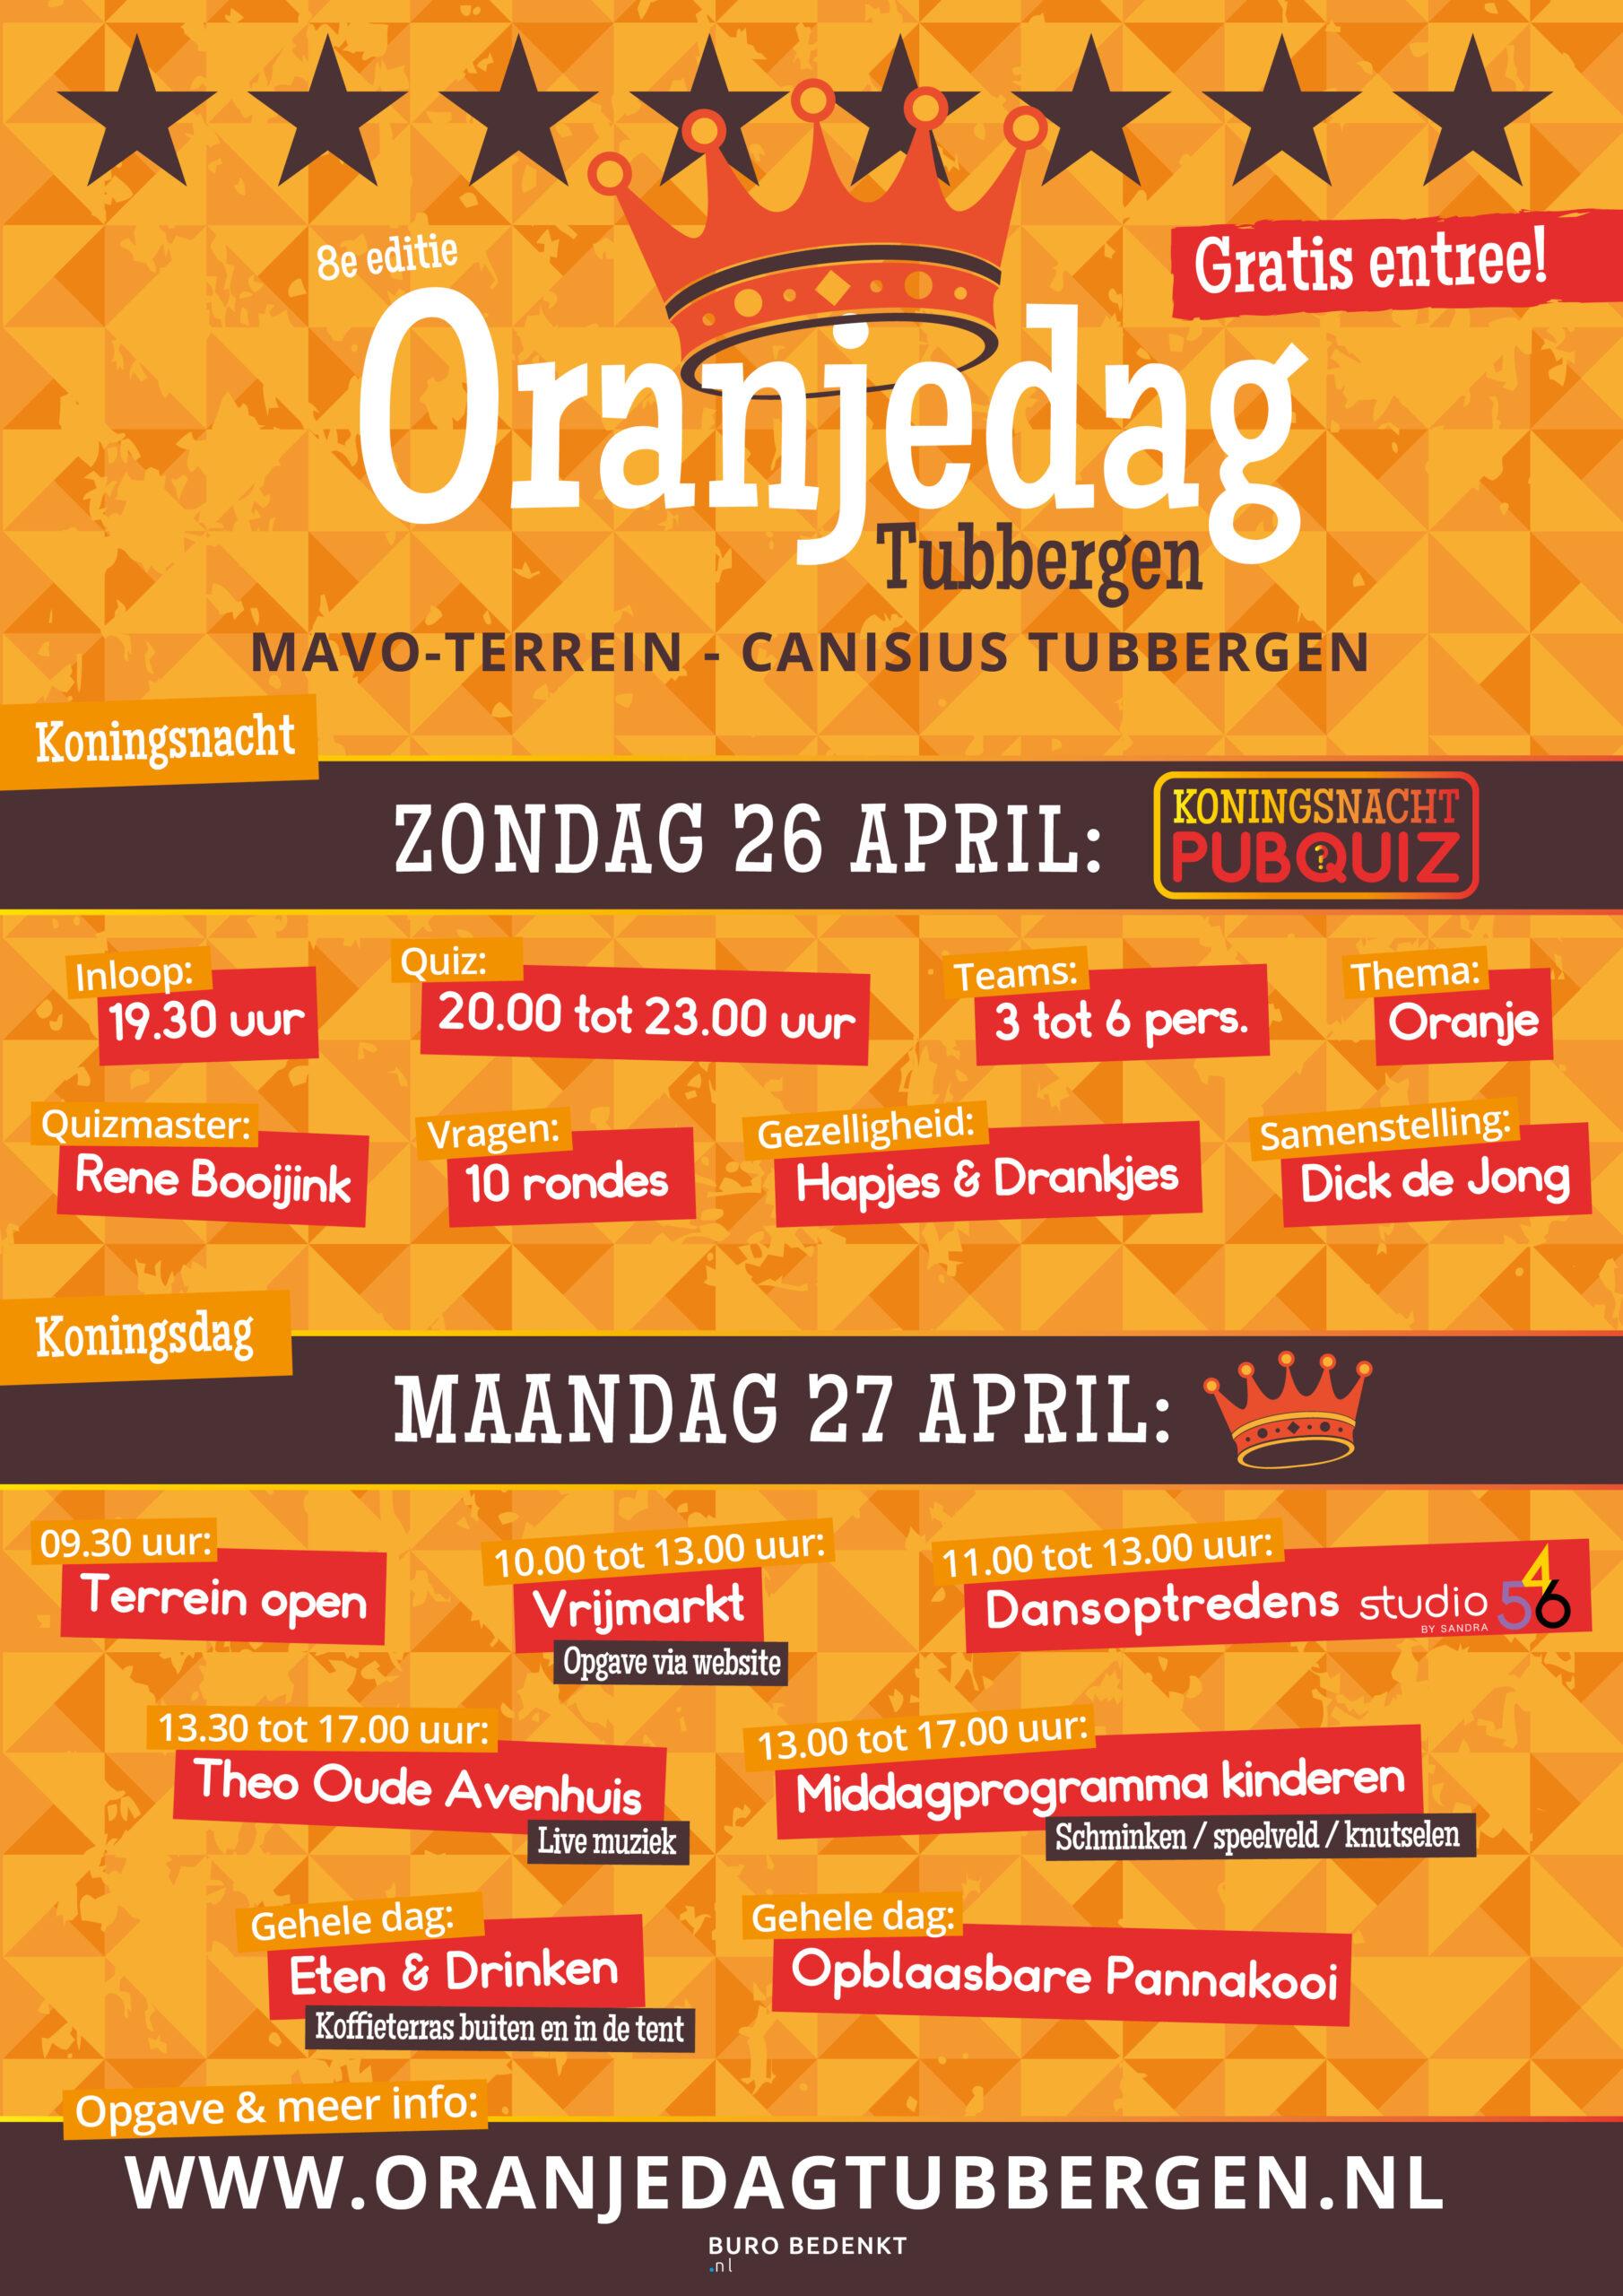 Digitaal-affiche-Oranjedag2020